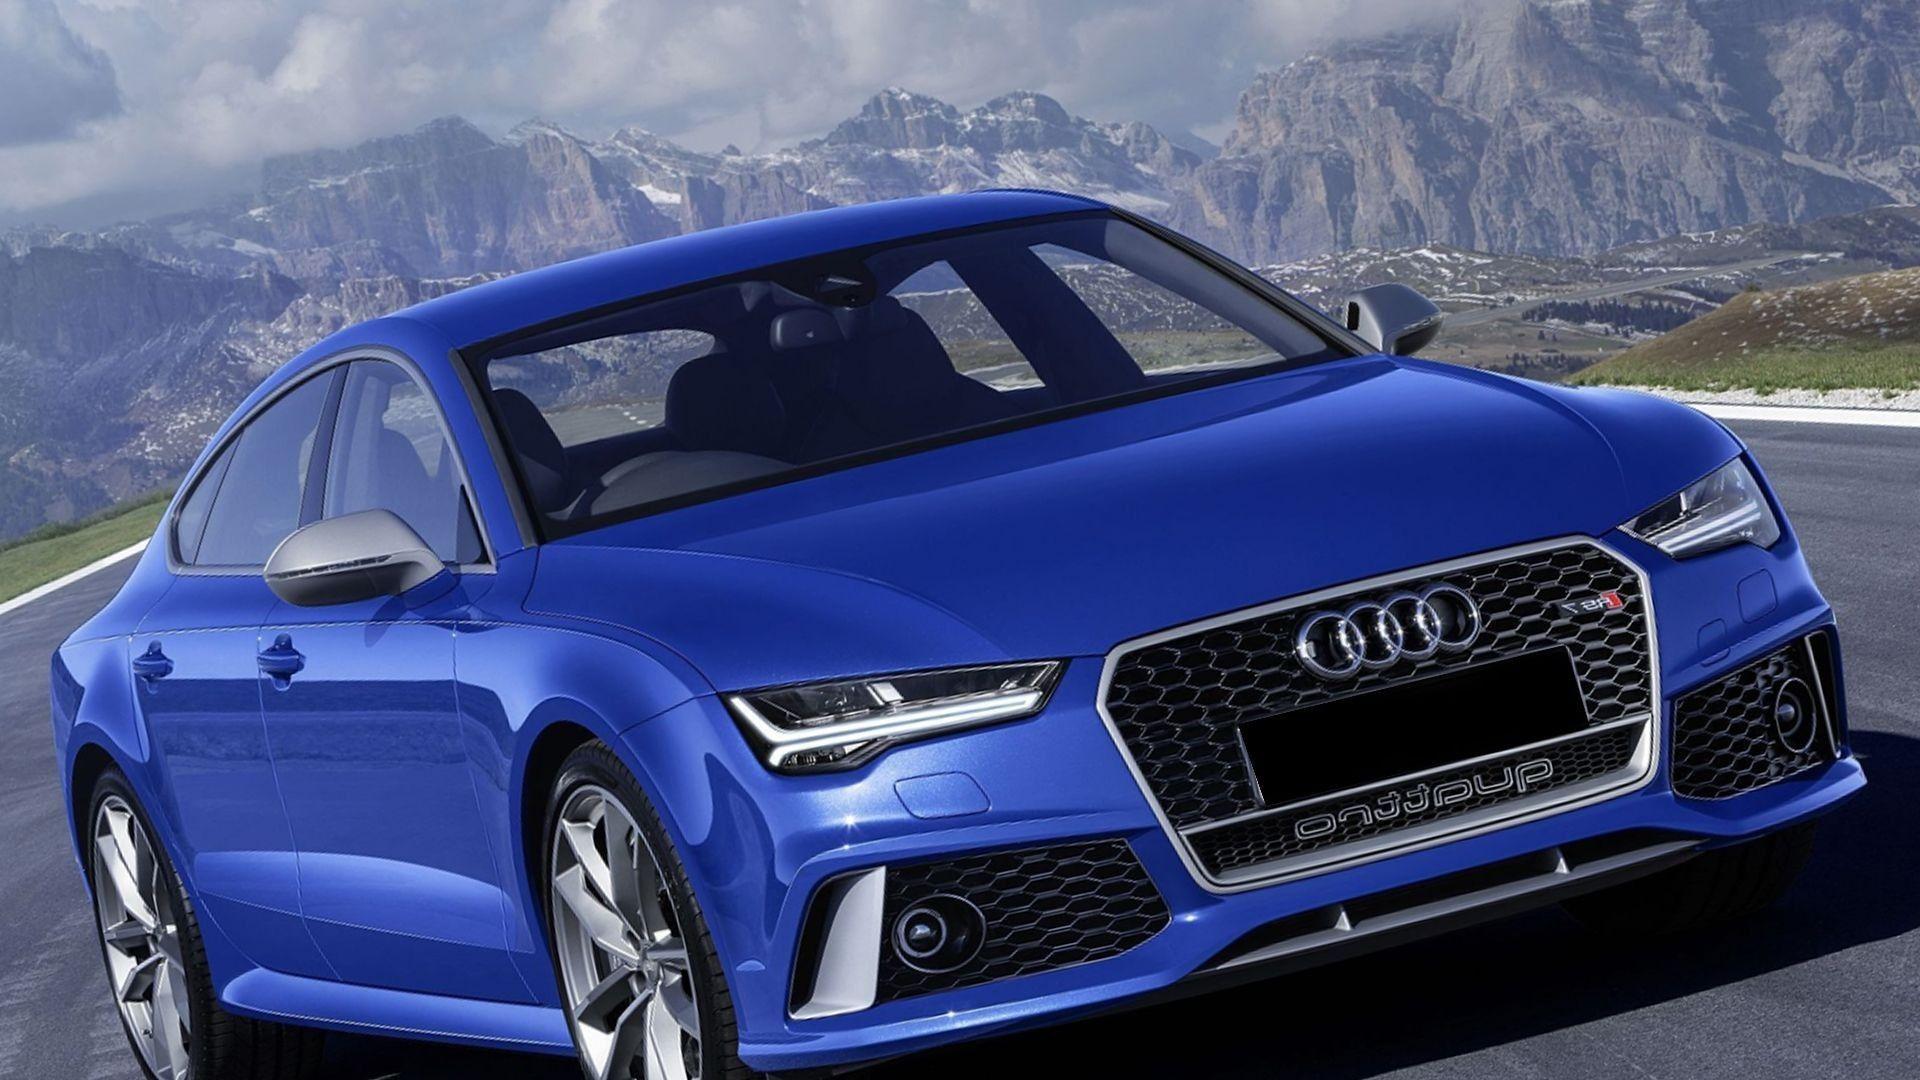 2019 Audi A9 | Audi, Car, Audi rs